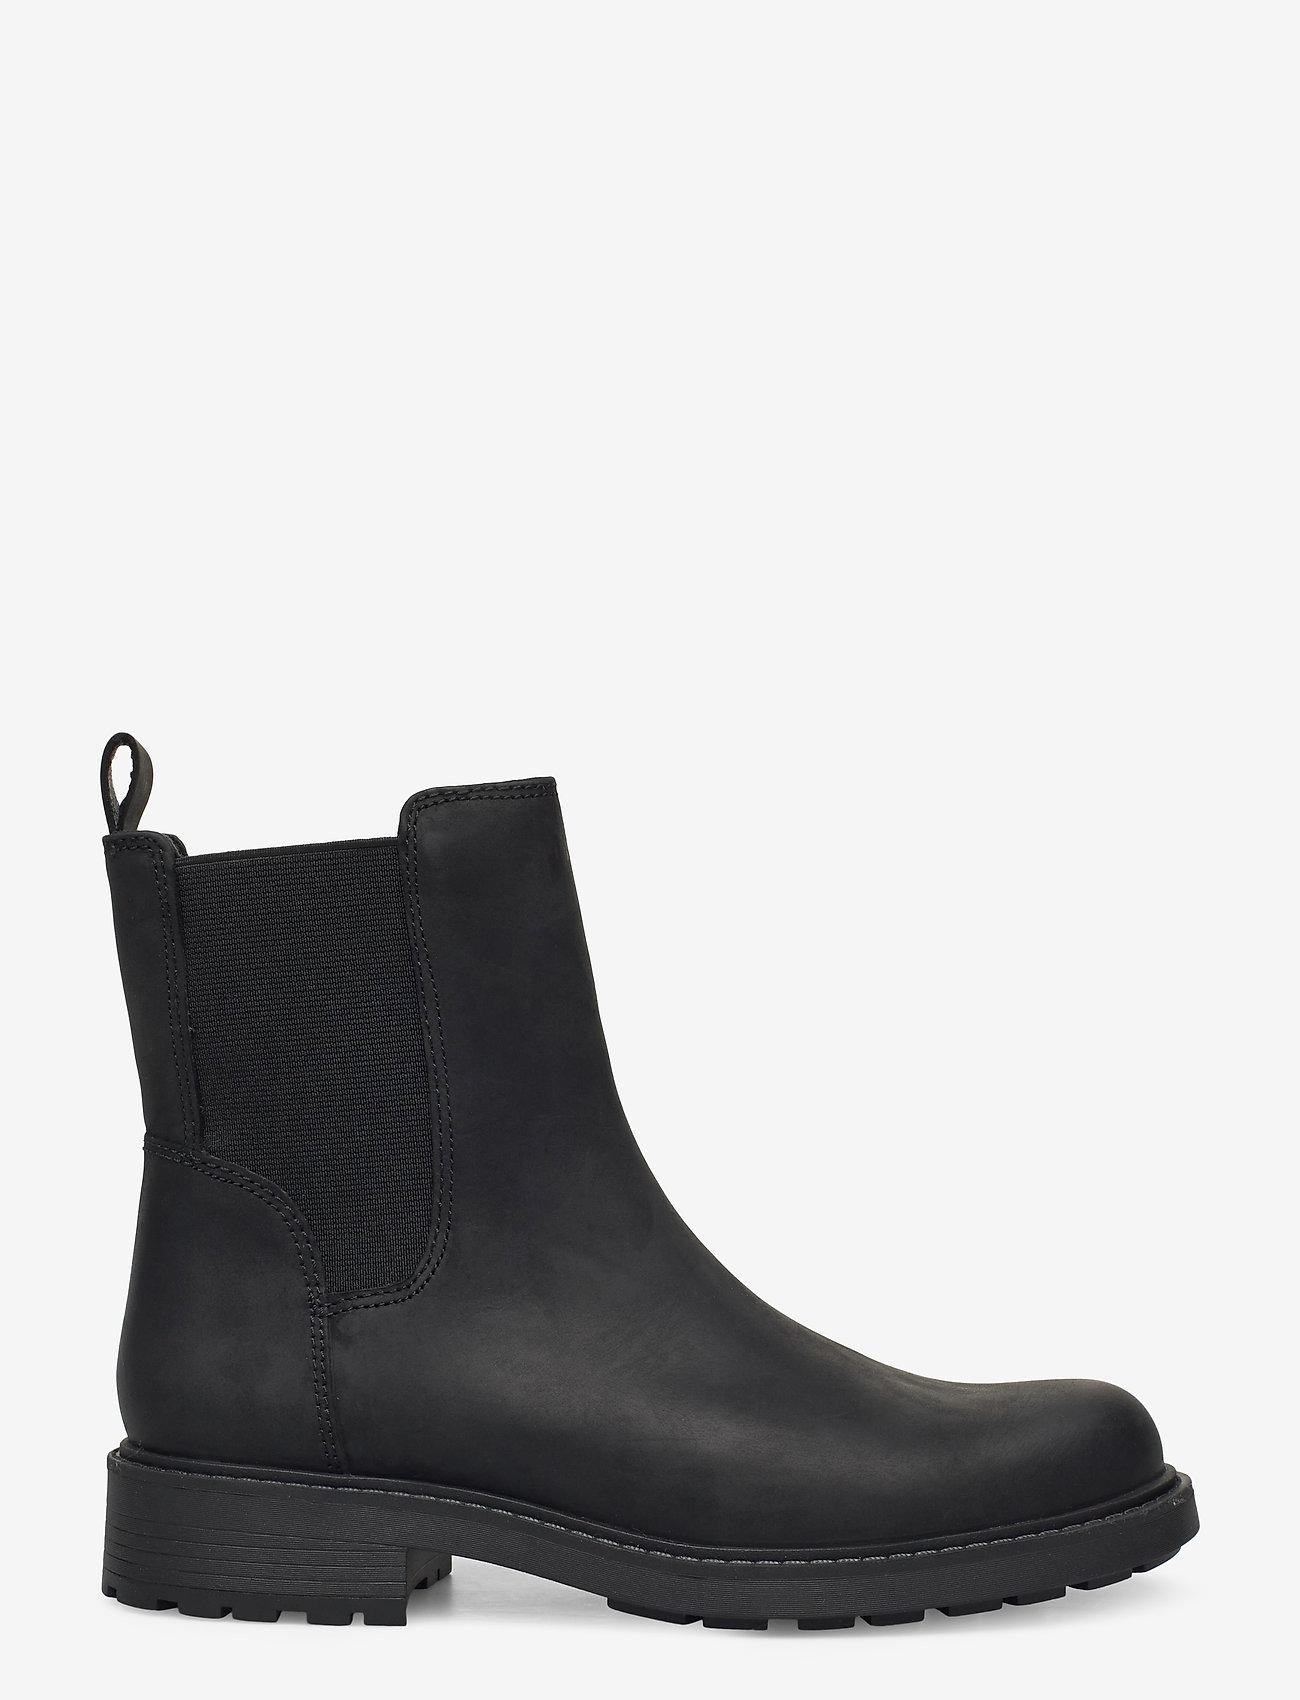 Clarks - Orinoco2 Top - chelsea boots - black leather - 1